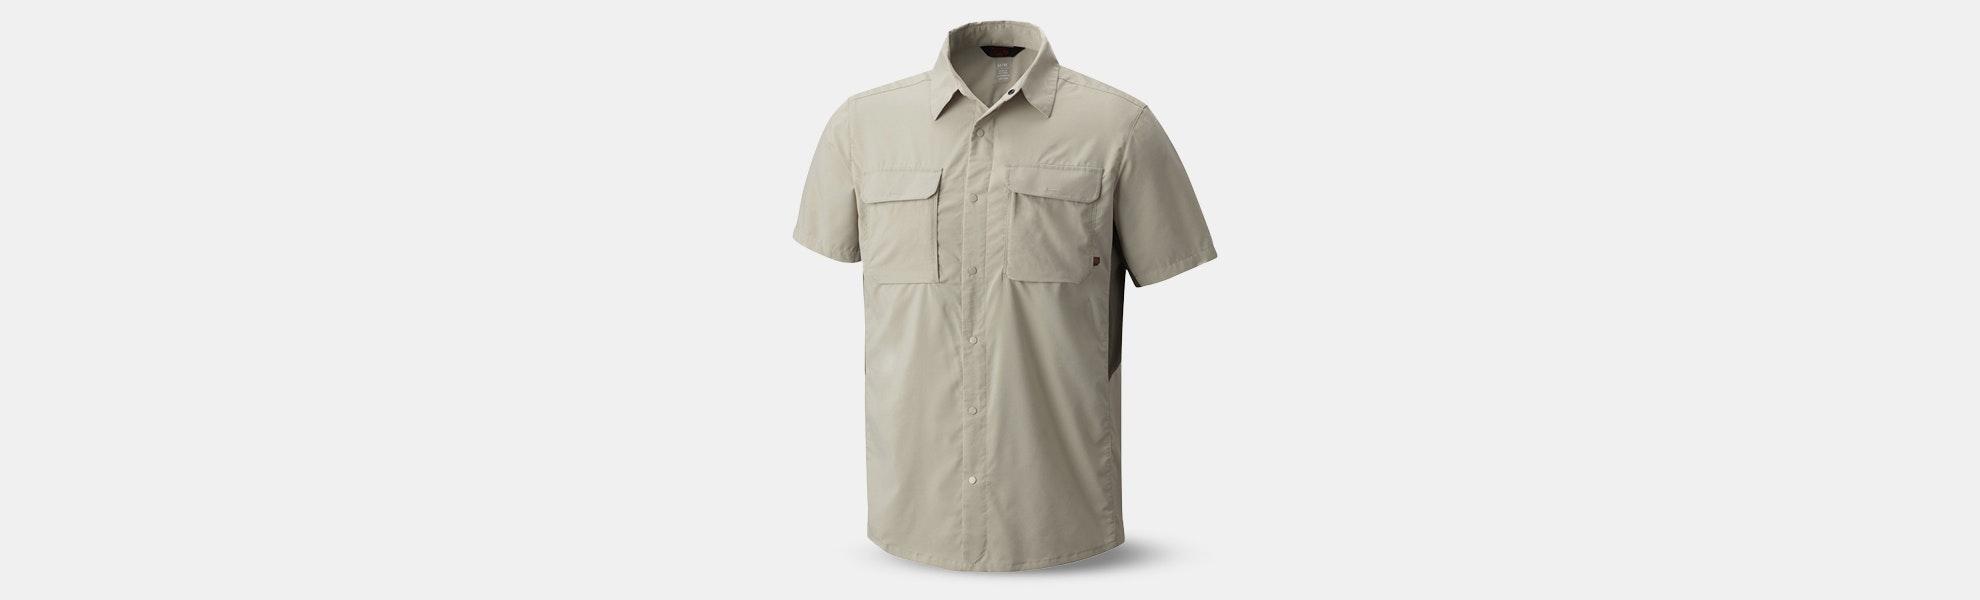 Mountain Hardwear Canyon Pro Men's Shirt